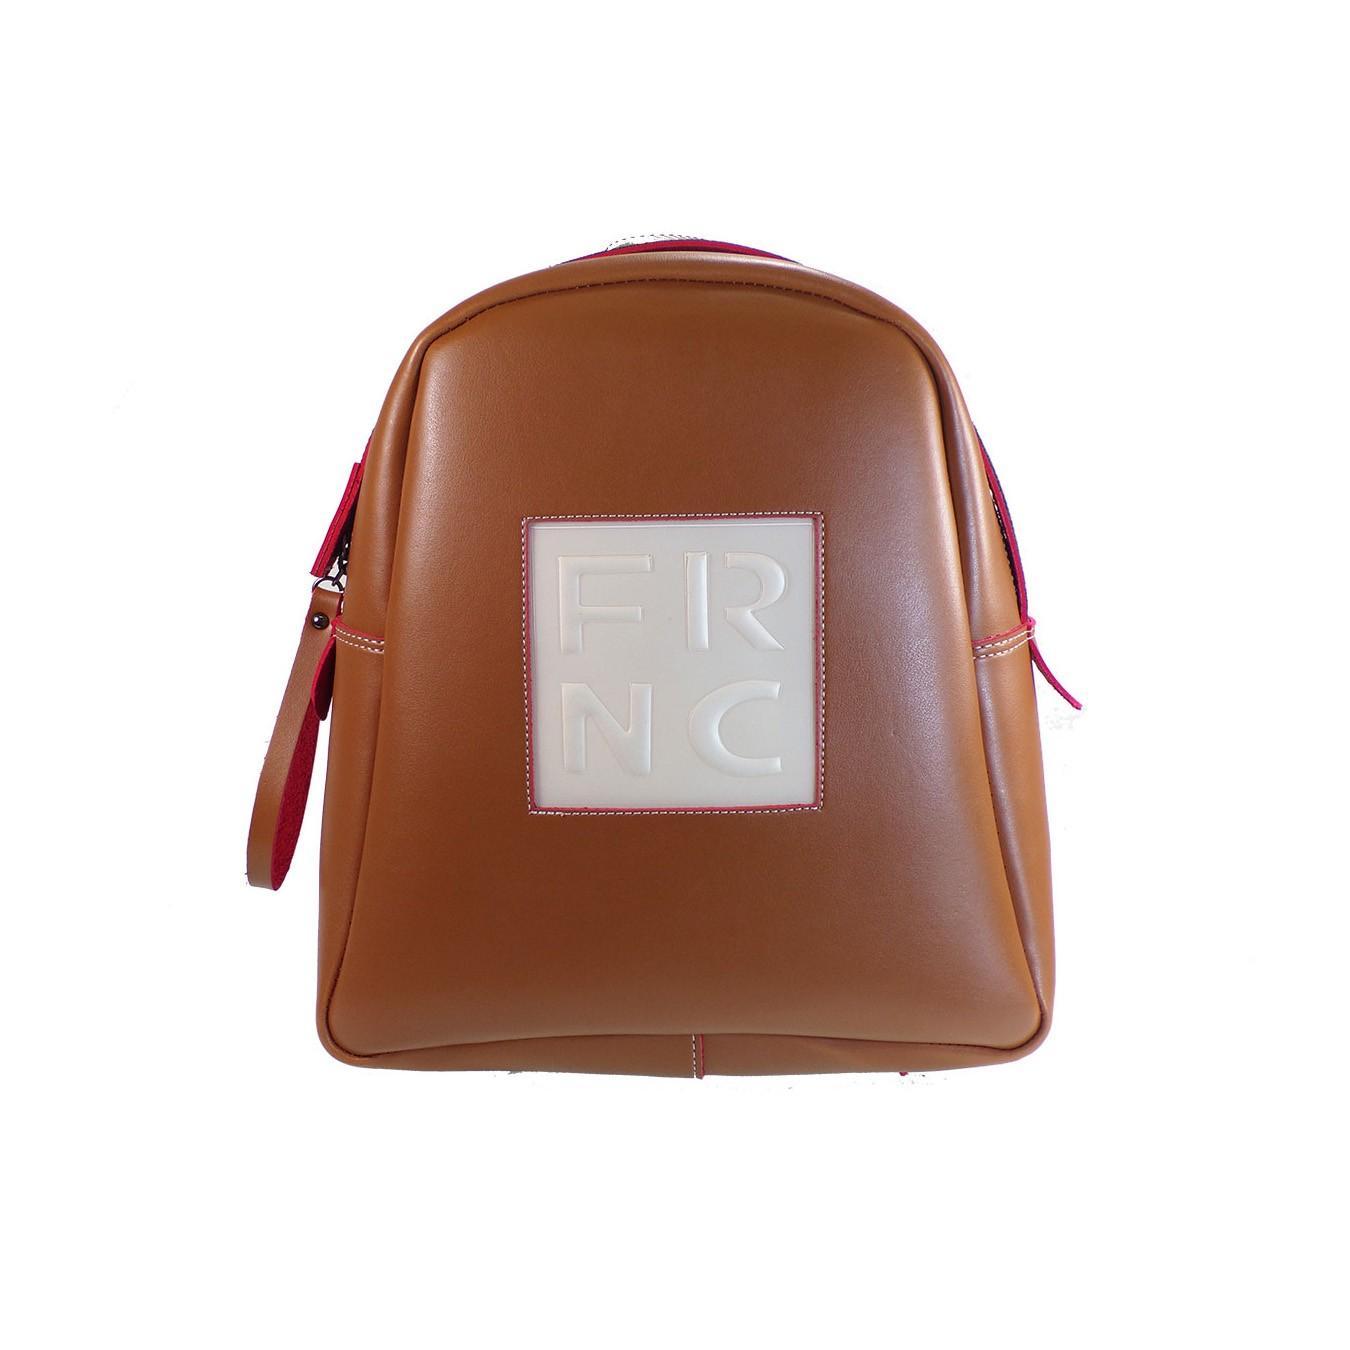 25a67fb34c FRNC FRANCESCO Τσάντα Γυναικεία Πλάτης-Backpack 1201 Ταμπά Δέρμα –  IShoeStore